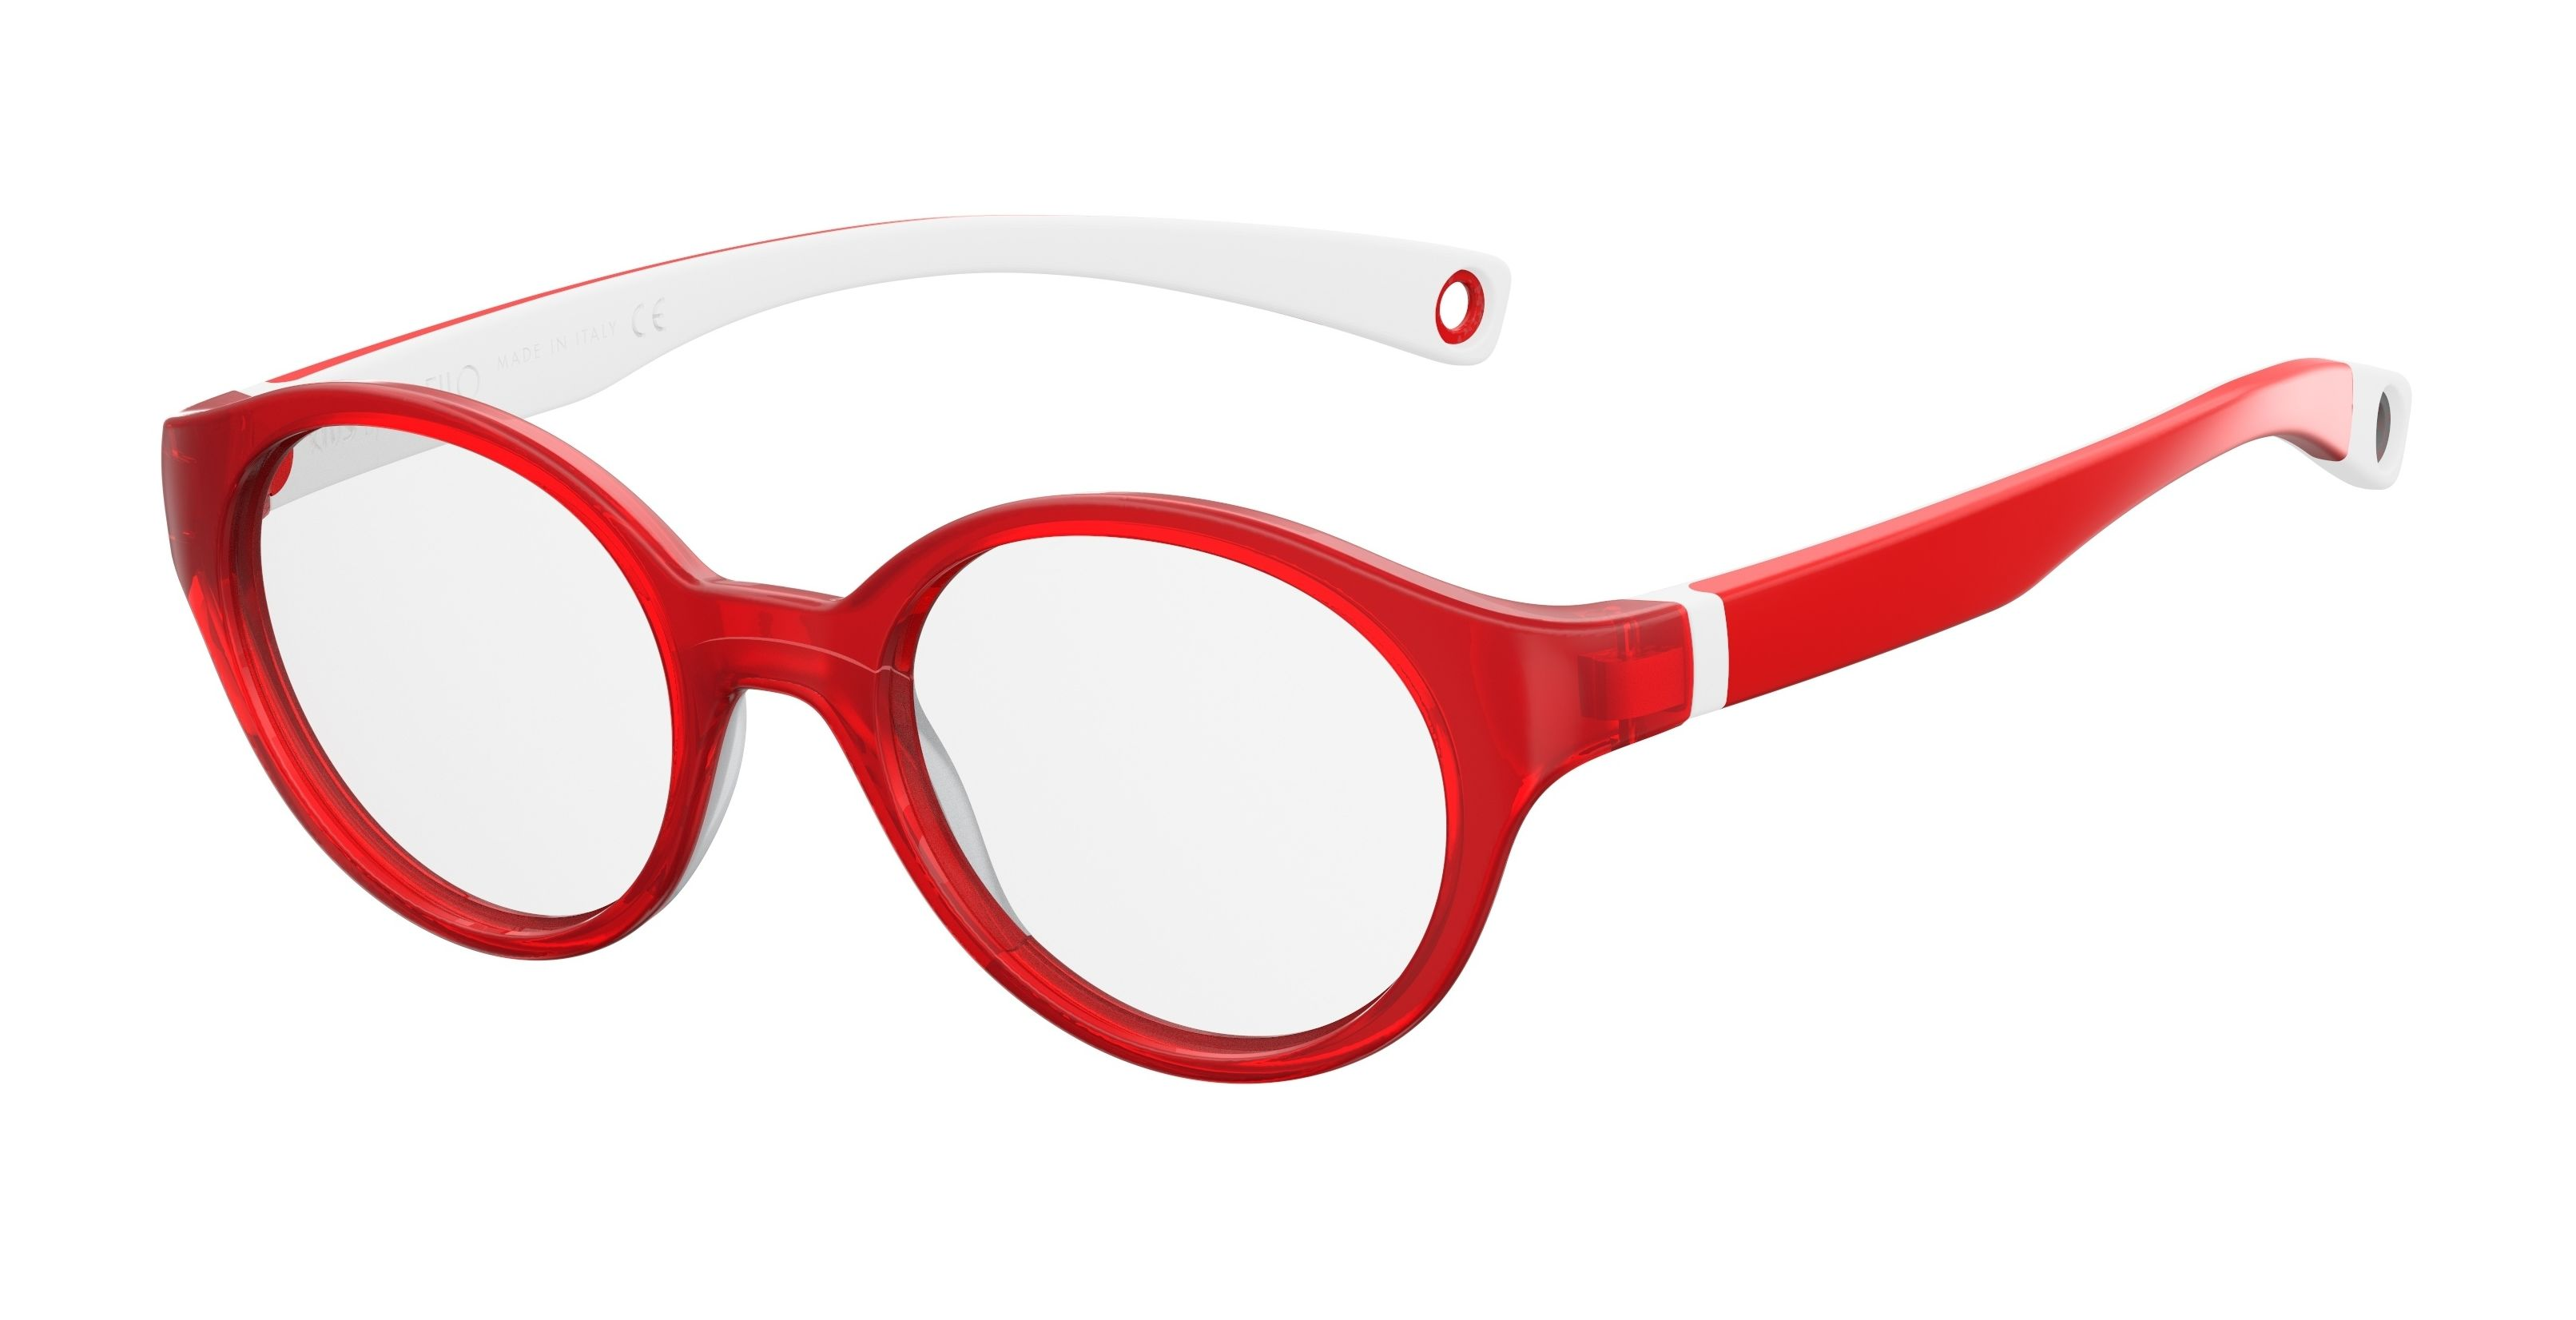 87235a4cdb9 Kids Glasses - Girl 6-8 years - Optiwow